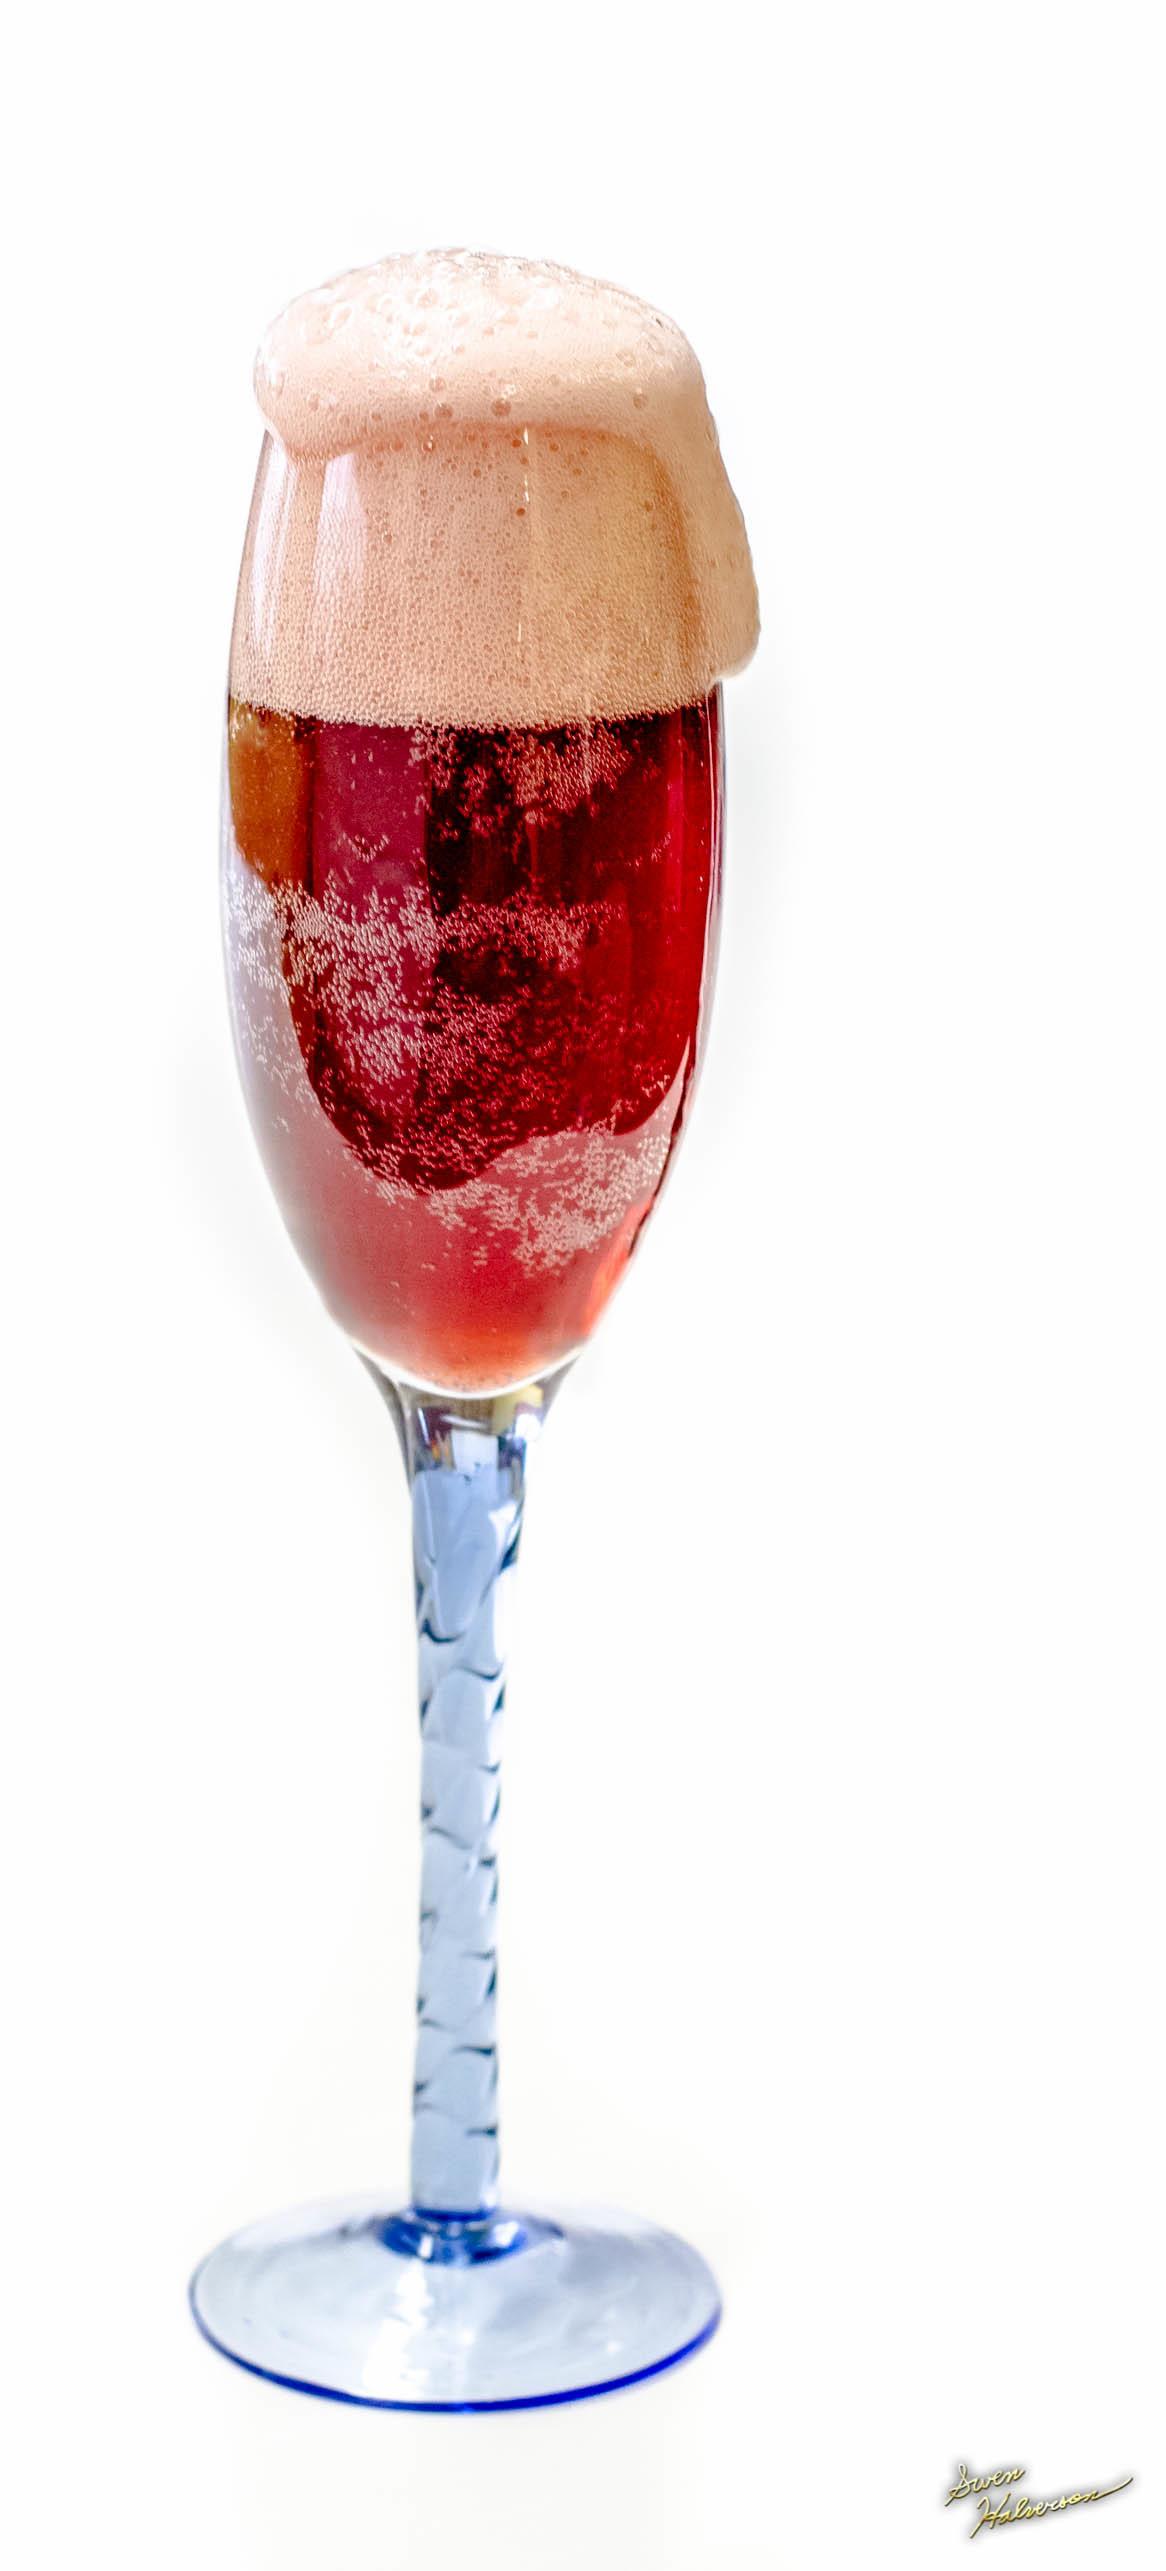 Theme: Sparkling | Title: Sparkling Cherry Juice